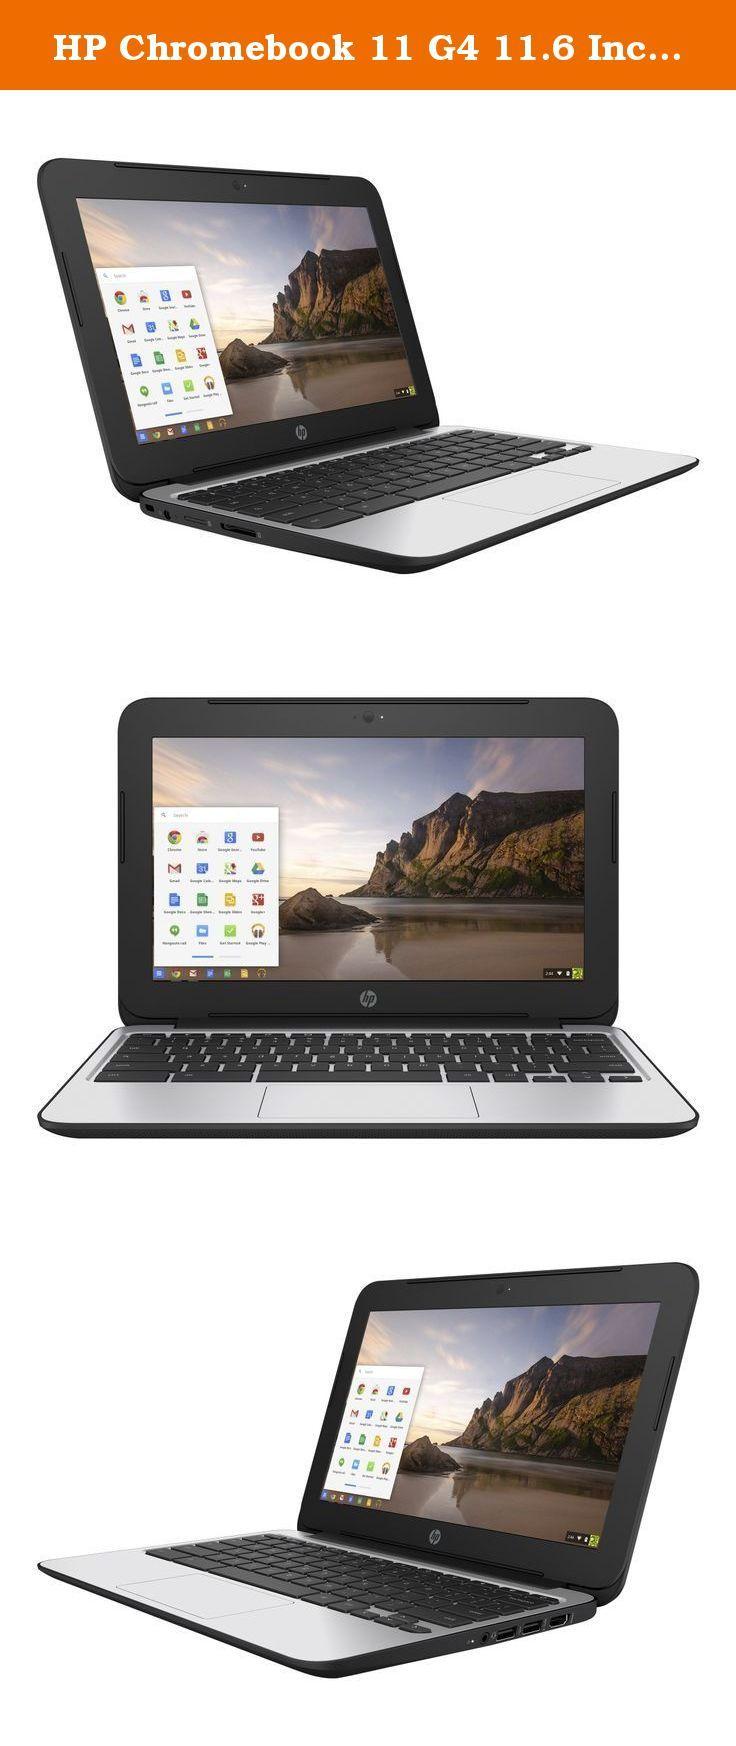 Hp Chromebook 11 G4 11 6 Inch Laptop Intel N2840 Dual Core 2gb Ram 16gb Flash Ssd Chrome Os Black Inspire L Hp Chromebook Chromebook 11 Intel Processors